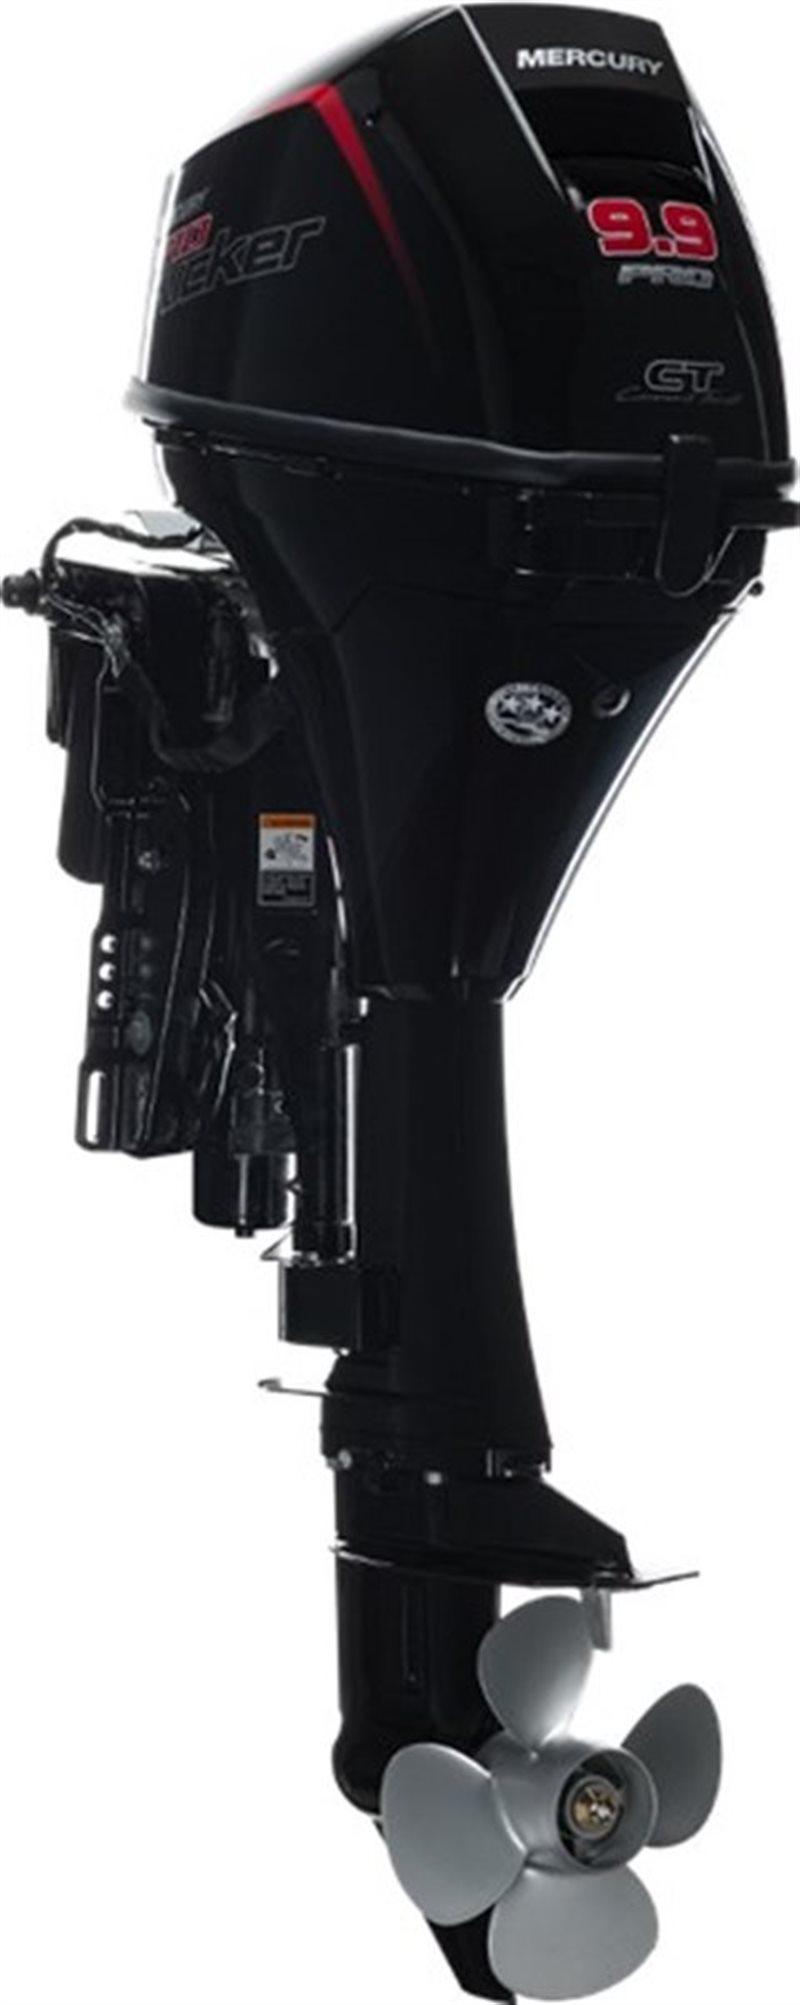 99 hp EFI ProKicker at Youngblood RV & Powersports Springfield Missouri - Ozark MO